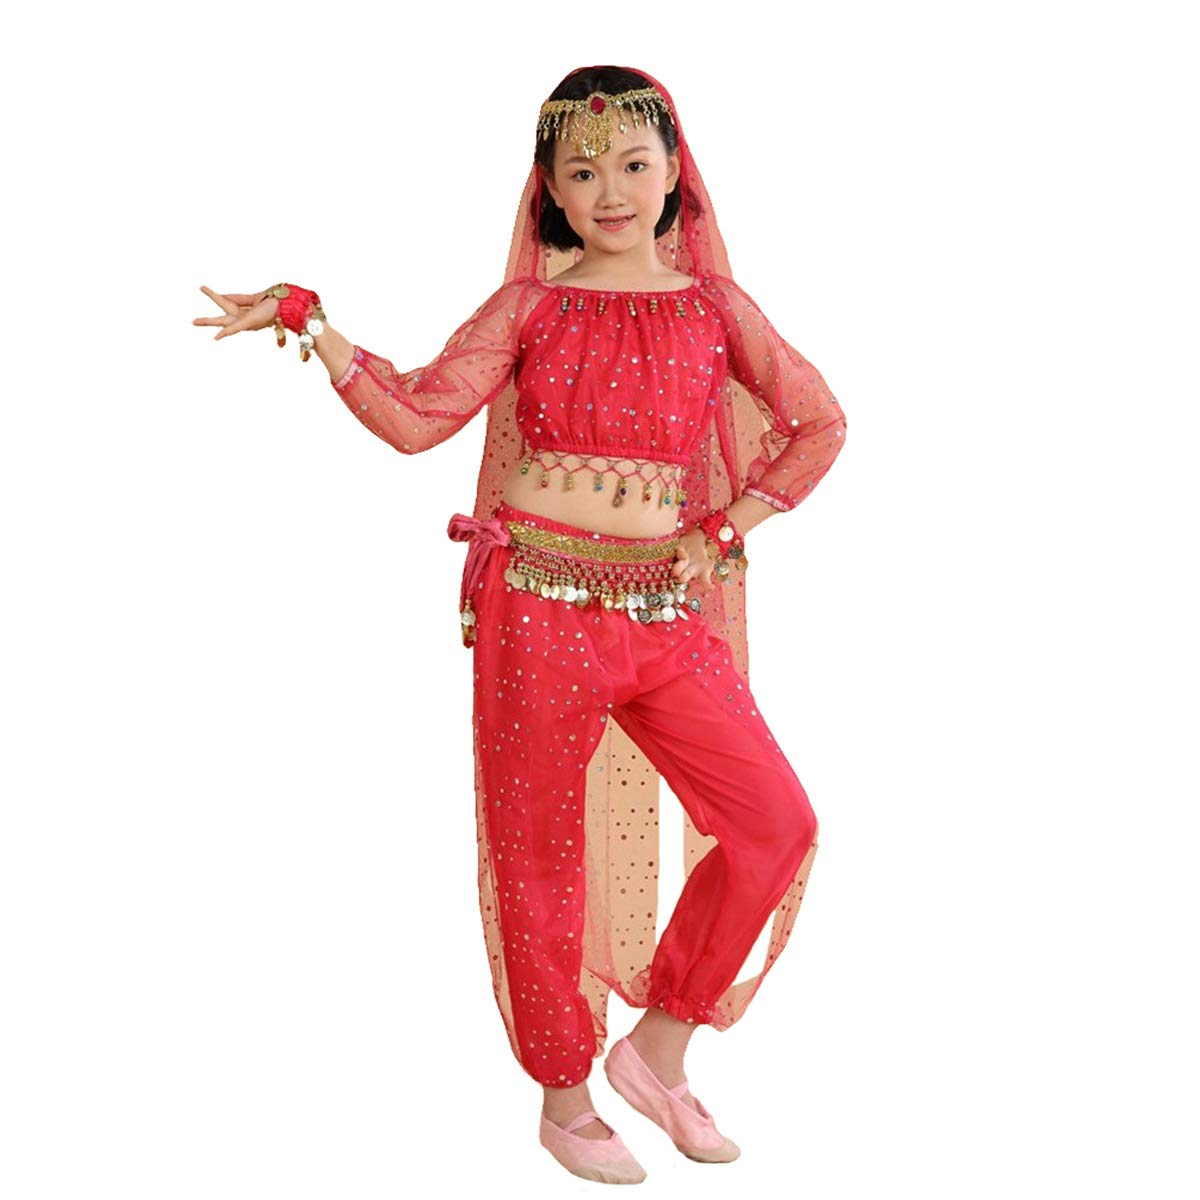 Maylong Girls Genie Harem Pants Belly Dance Outfit Halloween Costume Waist Wrap DW77